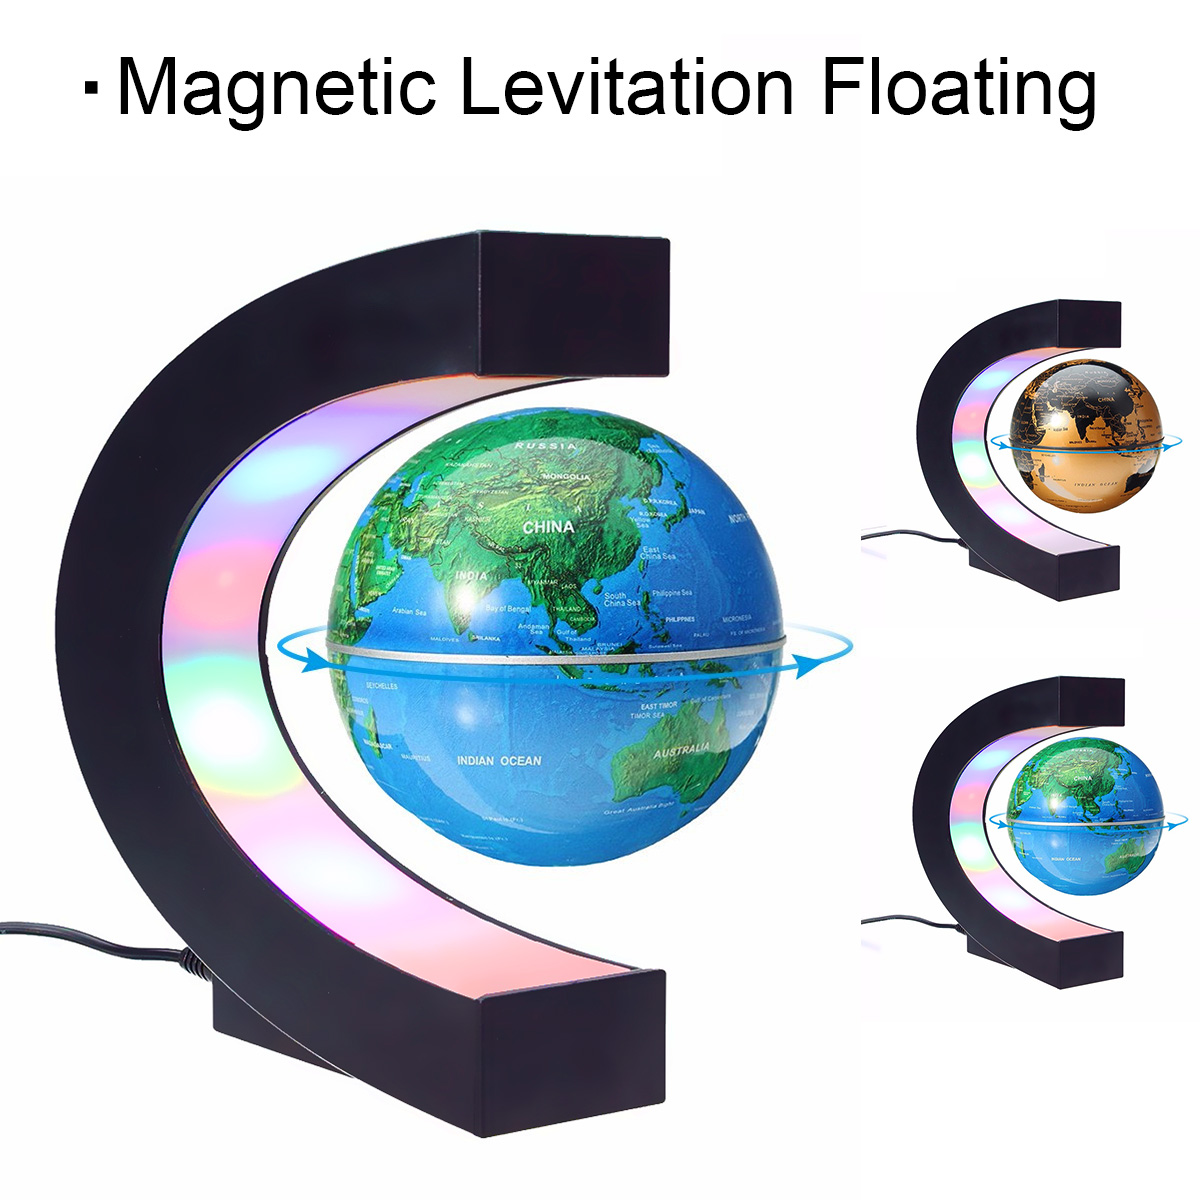 Forma Geografia Levitación Led Mapa Mundo Aprendizaje Juguetes Magnética Flotante C Terrestre Globo Tellurion Luz Niños Montessori De QBoerdCxW